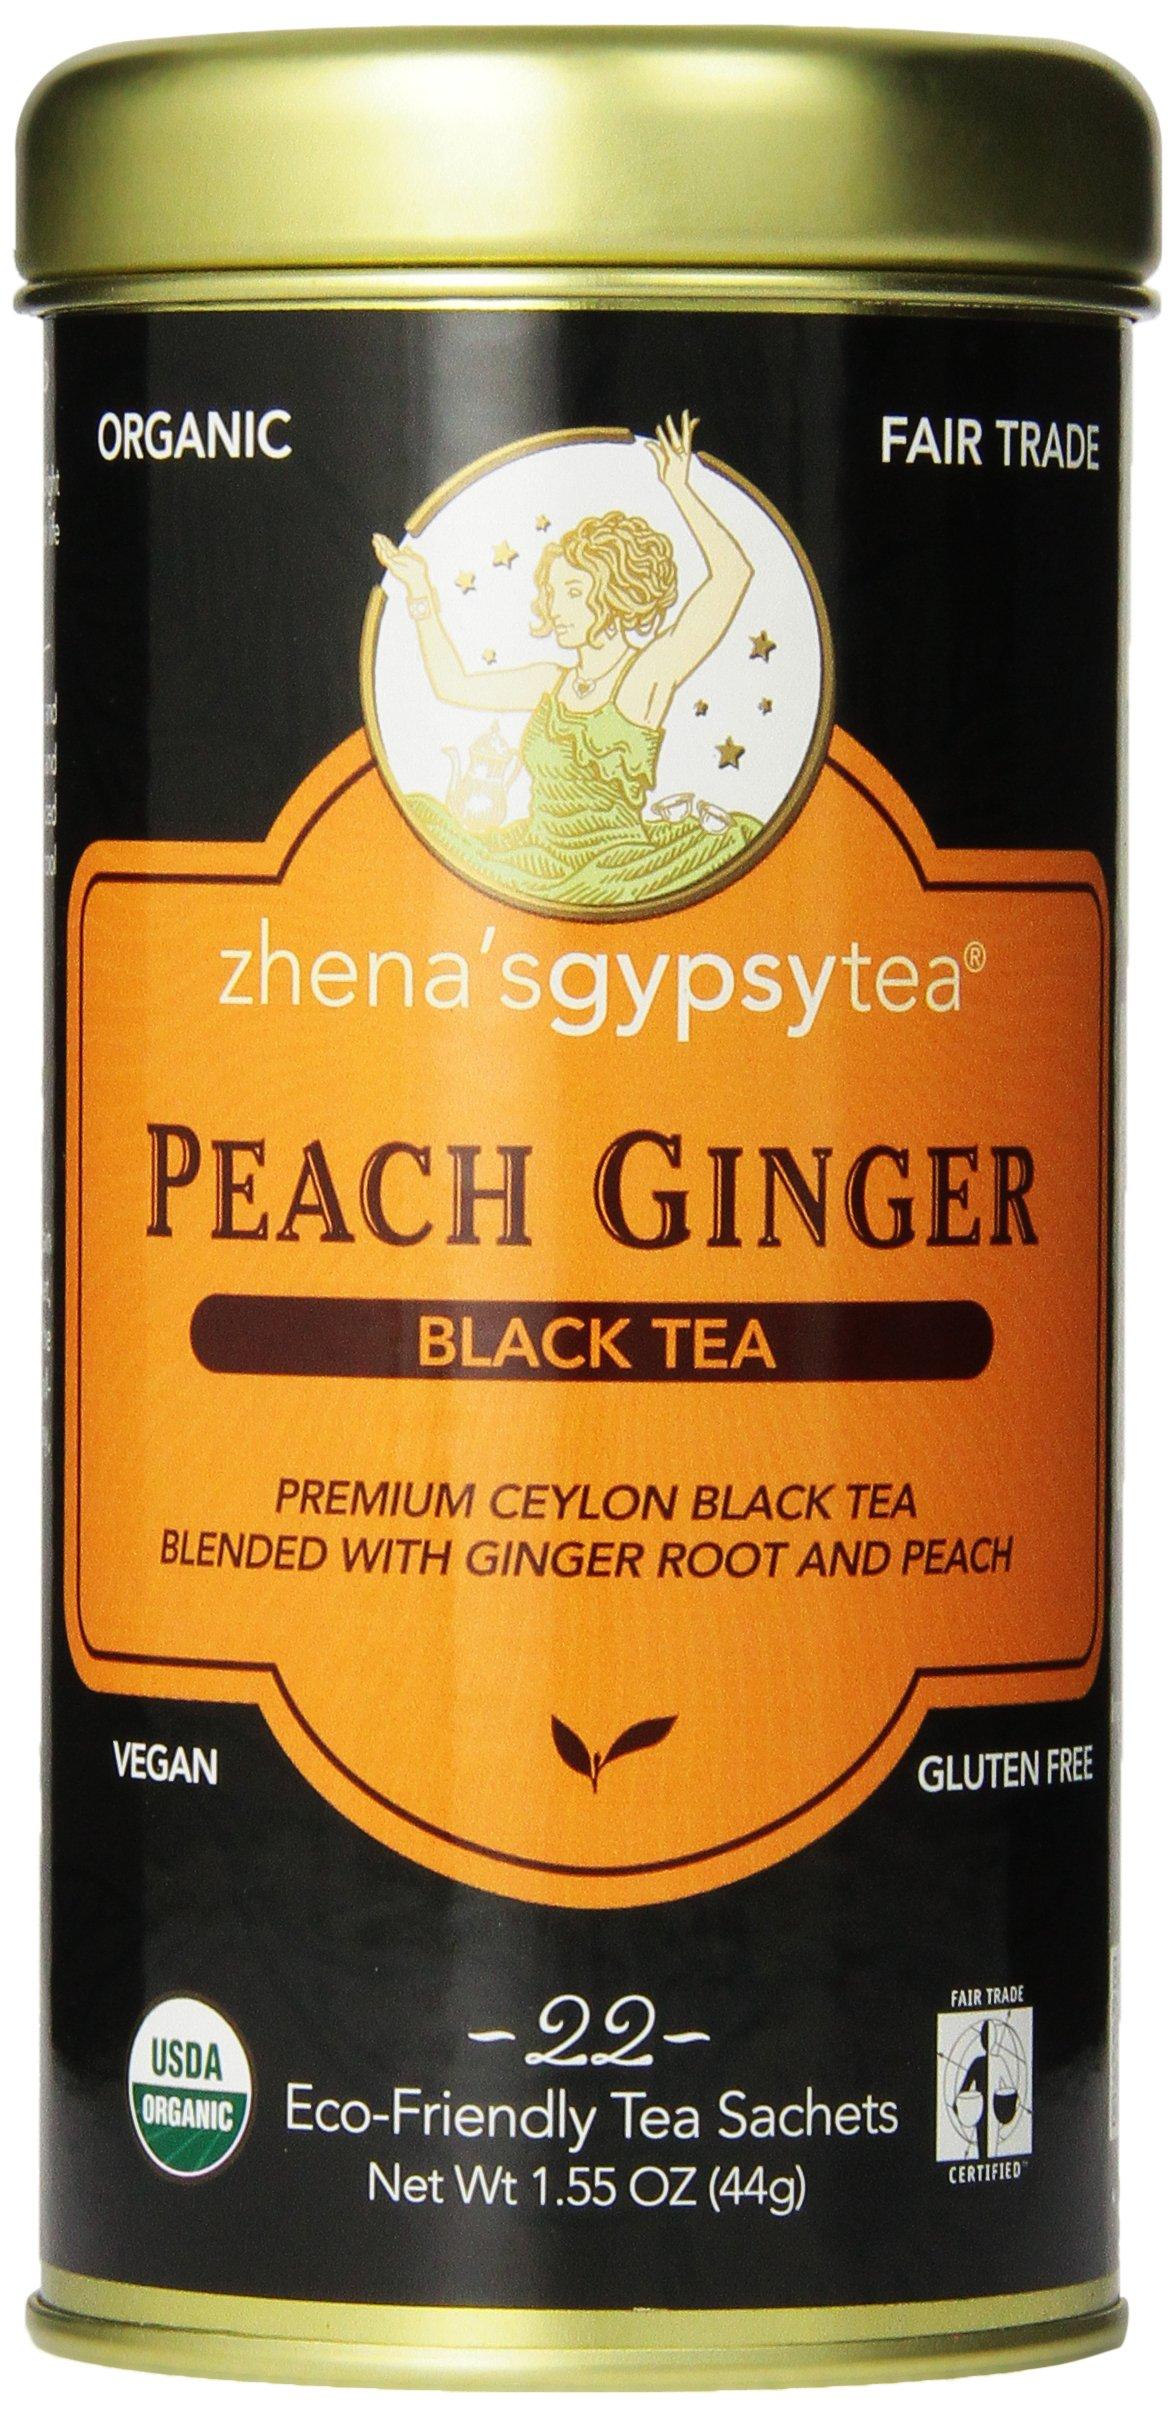 Zhena's Gypsy Tea, Peach Ginger,1.55 oz(44g),  22 Count Tea Sachet